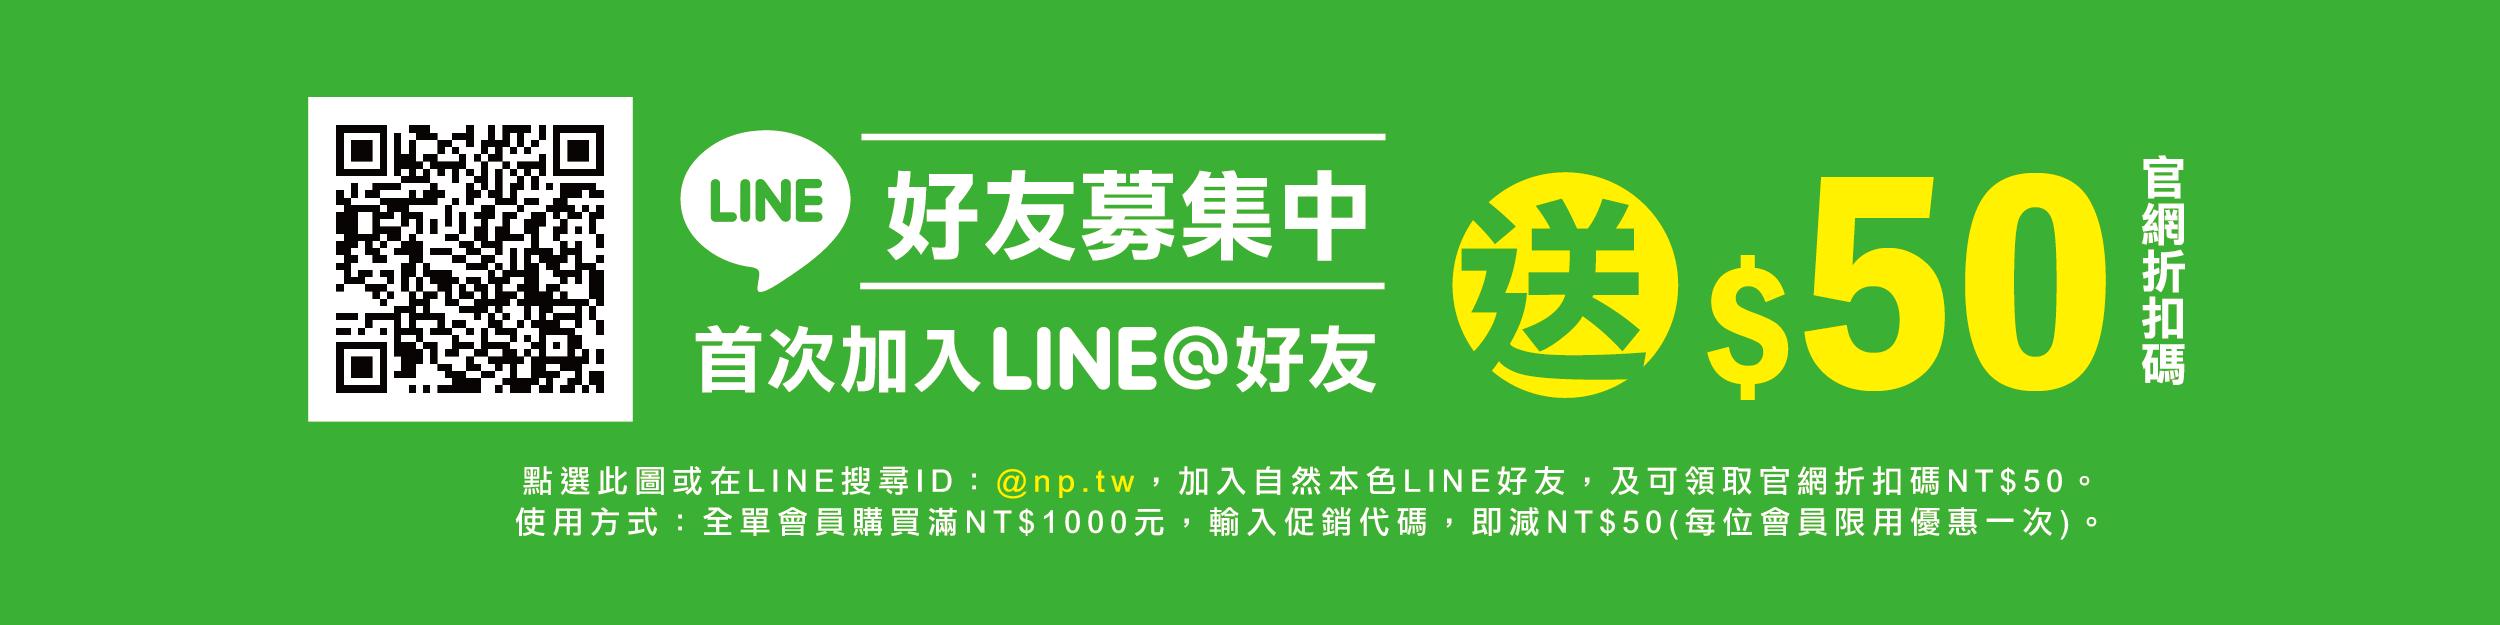 自然本色 LINE@好友募集